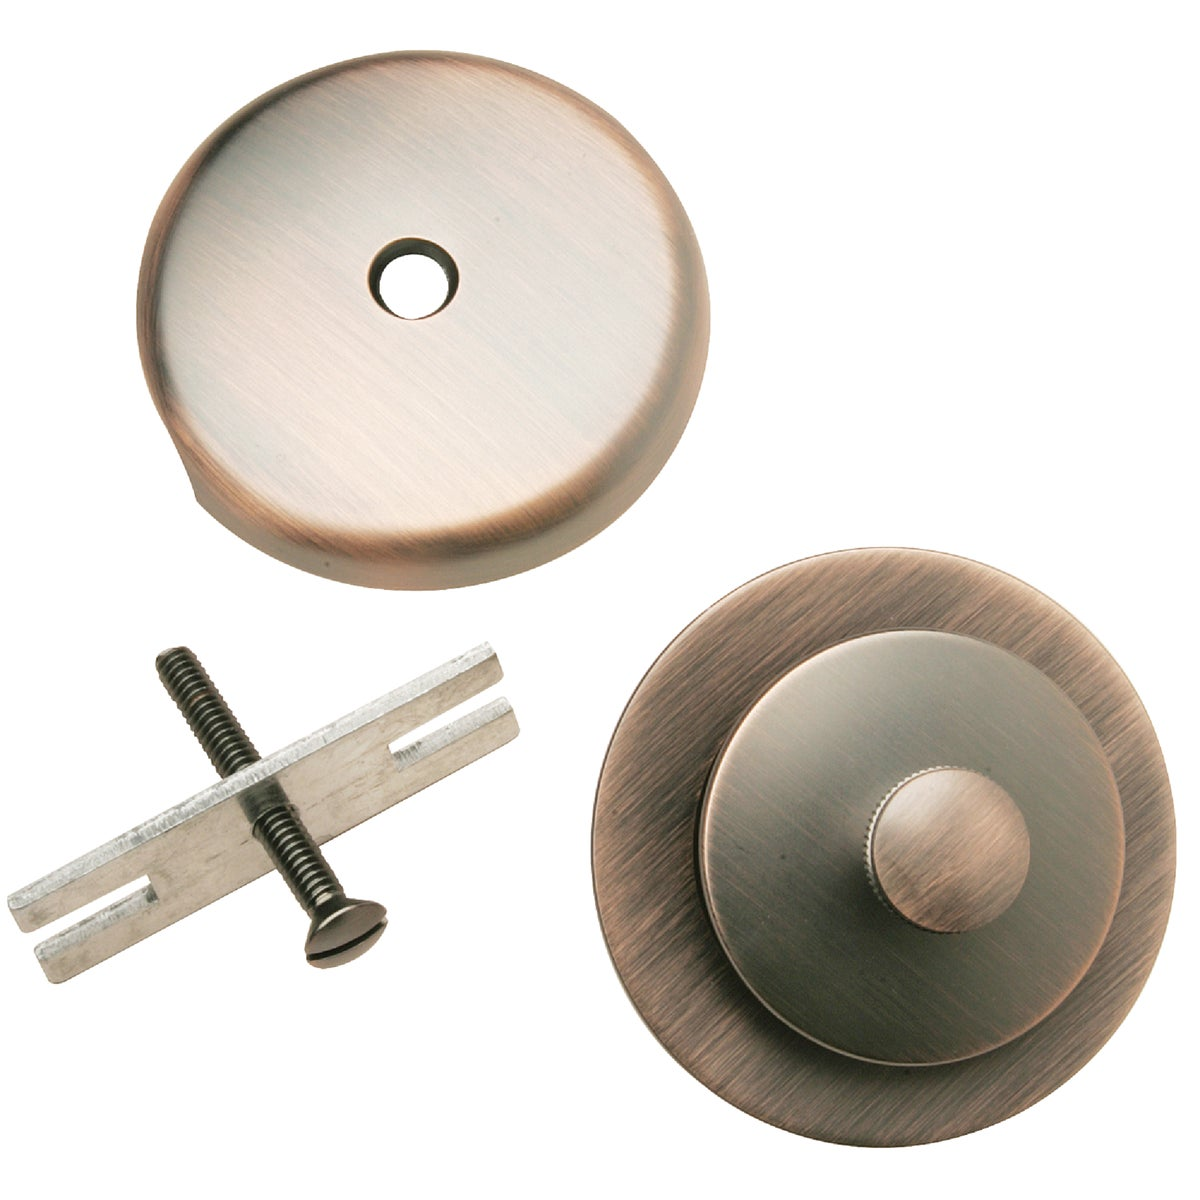 Plumb Pak/Keeney Mfg. VB ROLLER BALL TRIM KIT 438832